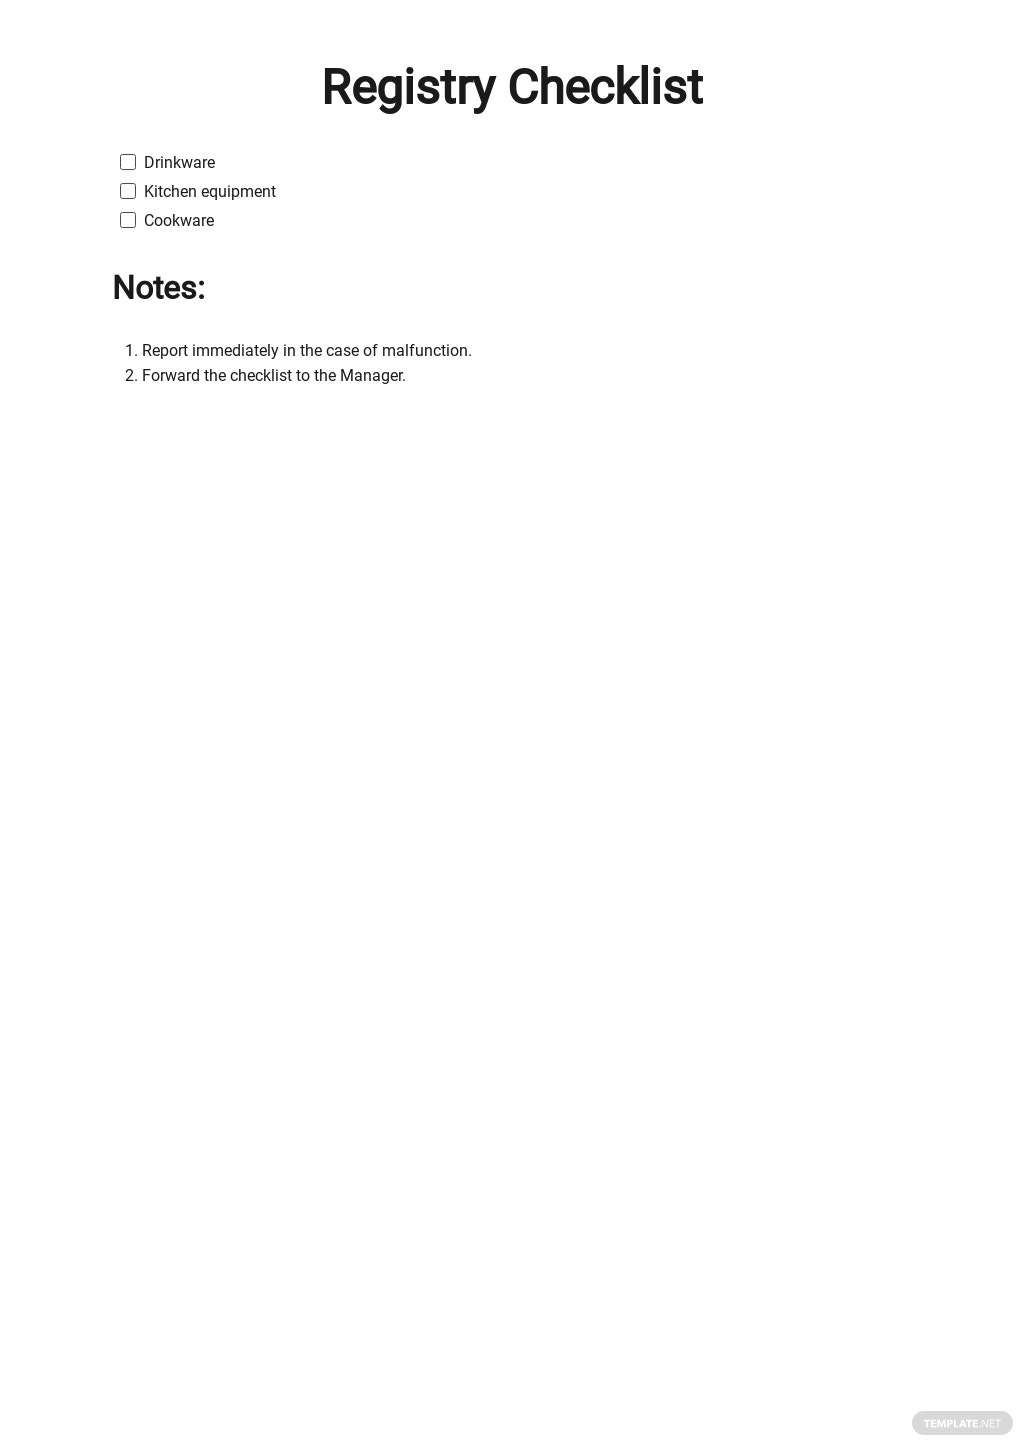 Registry Checklist Template.jpe